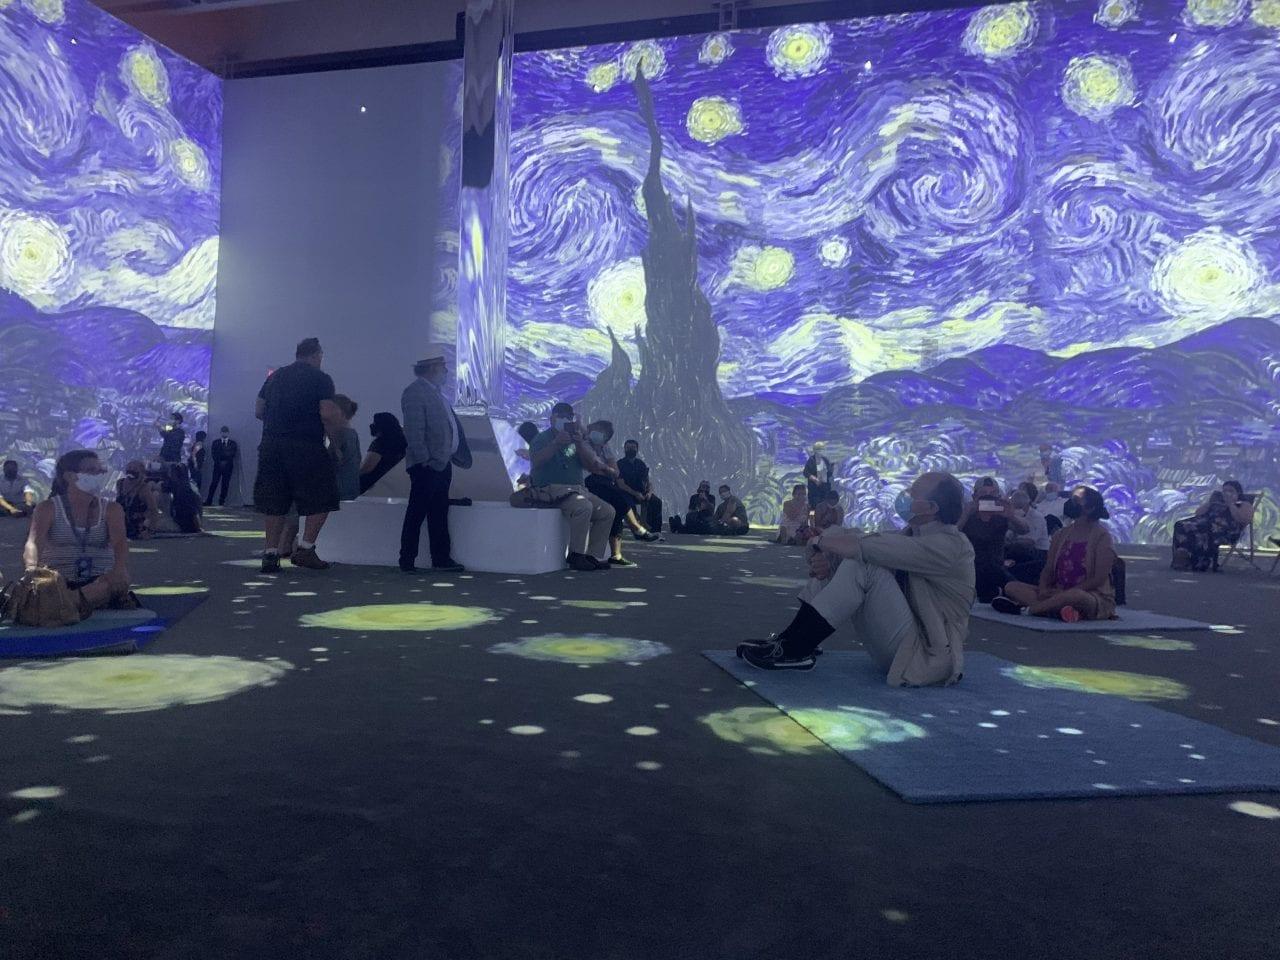 Van Gogh immersive-full-room-view of starry night